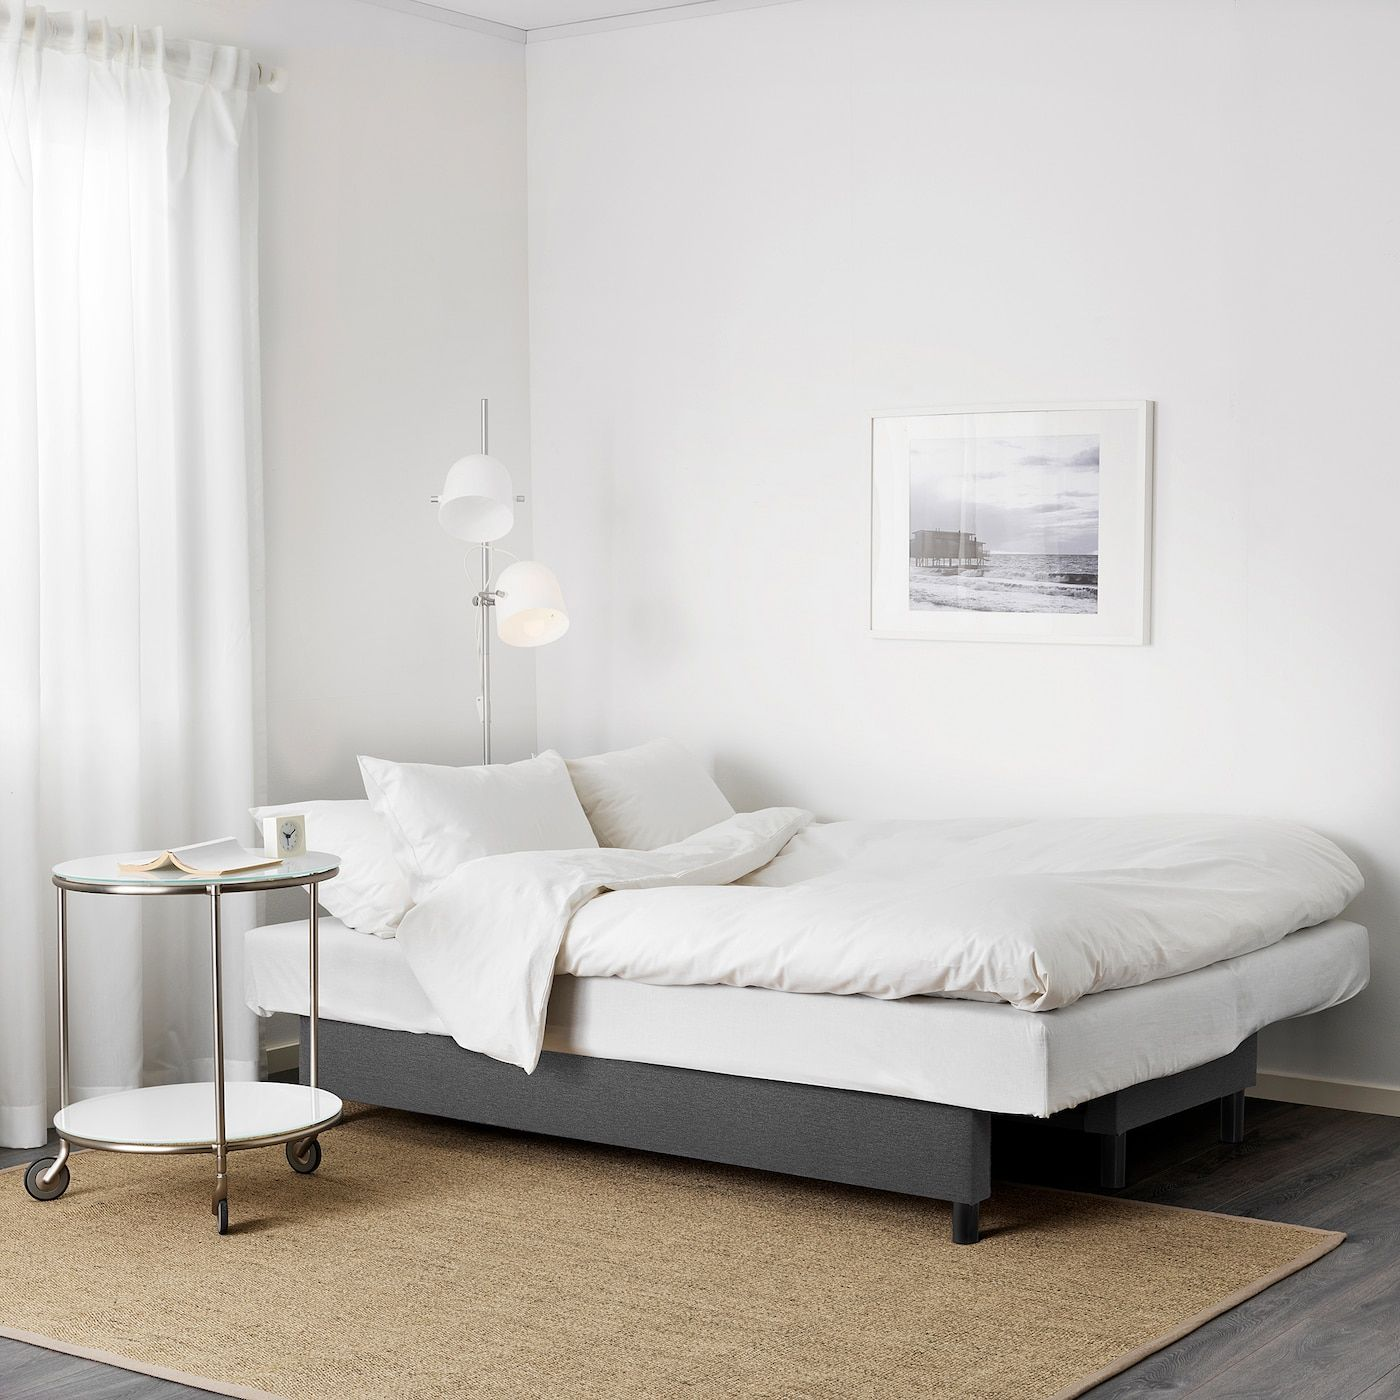 Asarum 3 Seat Sofa Bed Knisa Dark Grey In 2020 Ikea Sofa Bed